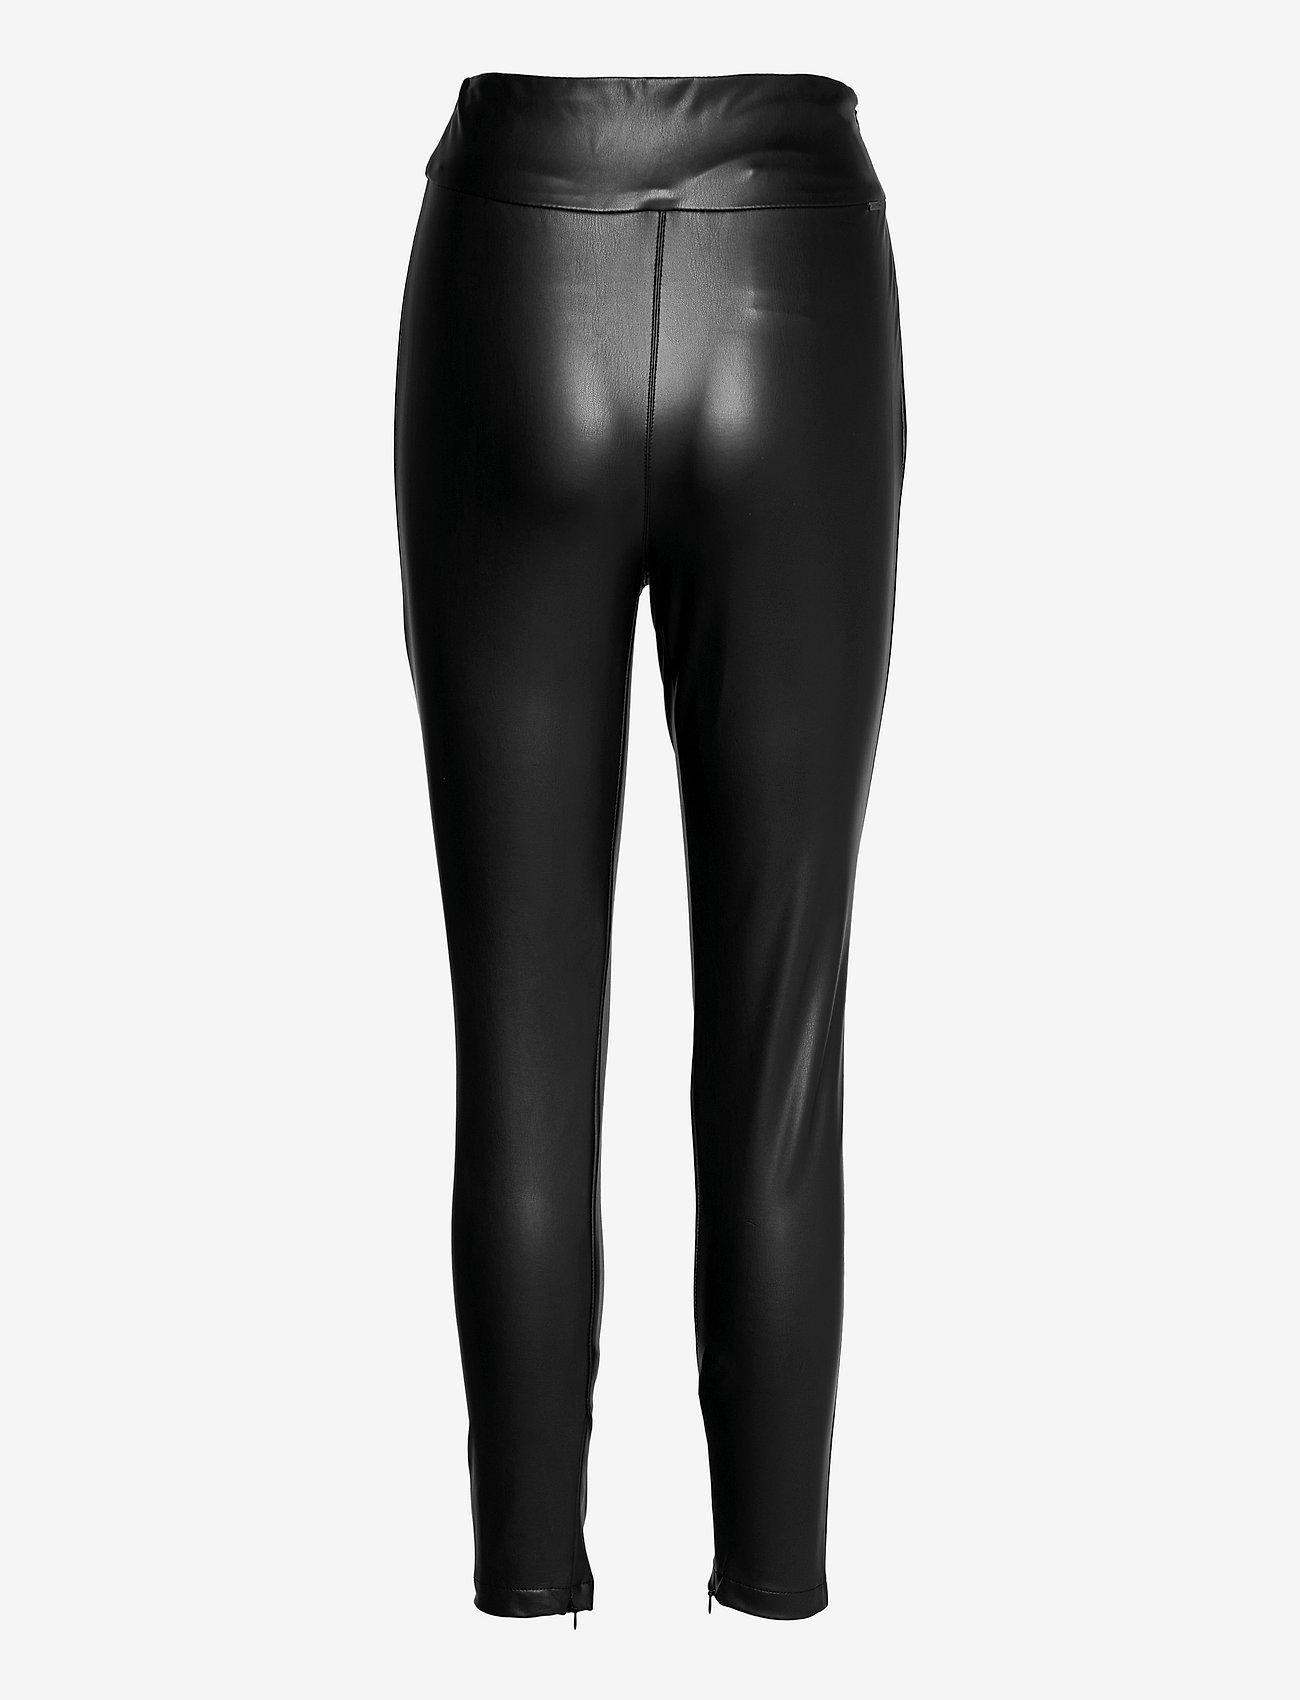 GUESS Jeans - PRISCILLA LEGGINGS - skinnbyxor - jet black a996 - 1